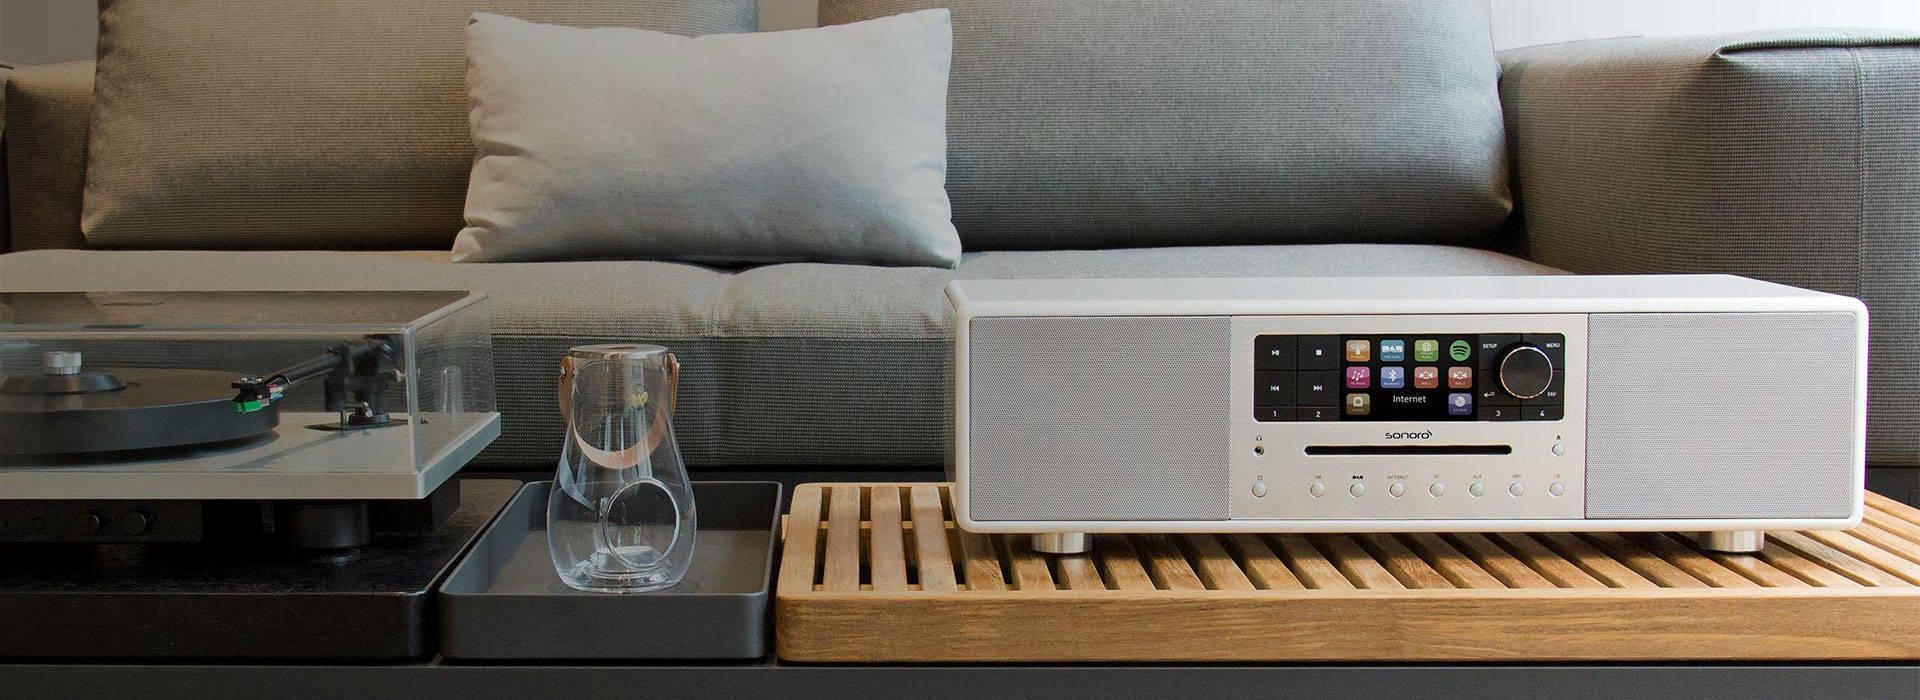 Sonoro Audiosysteme Authorisierter Vertragspartner Perfekter Klang in jedem Raum. Ab € 299,00